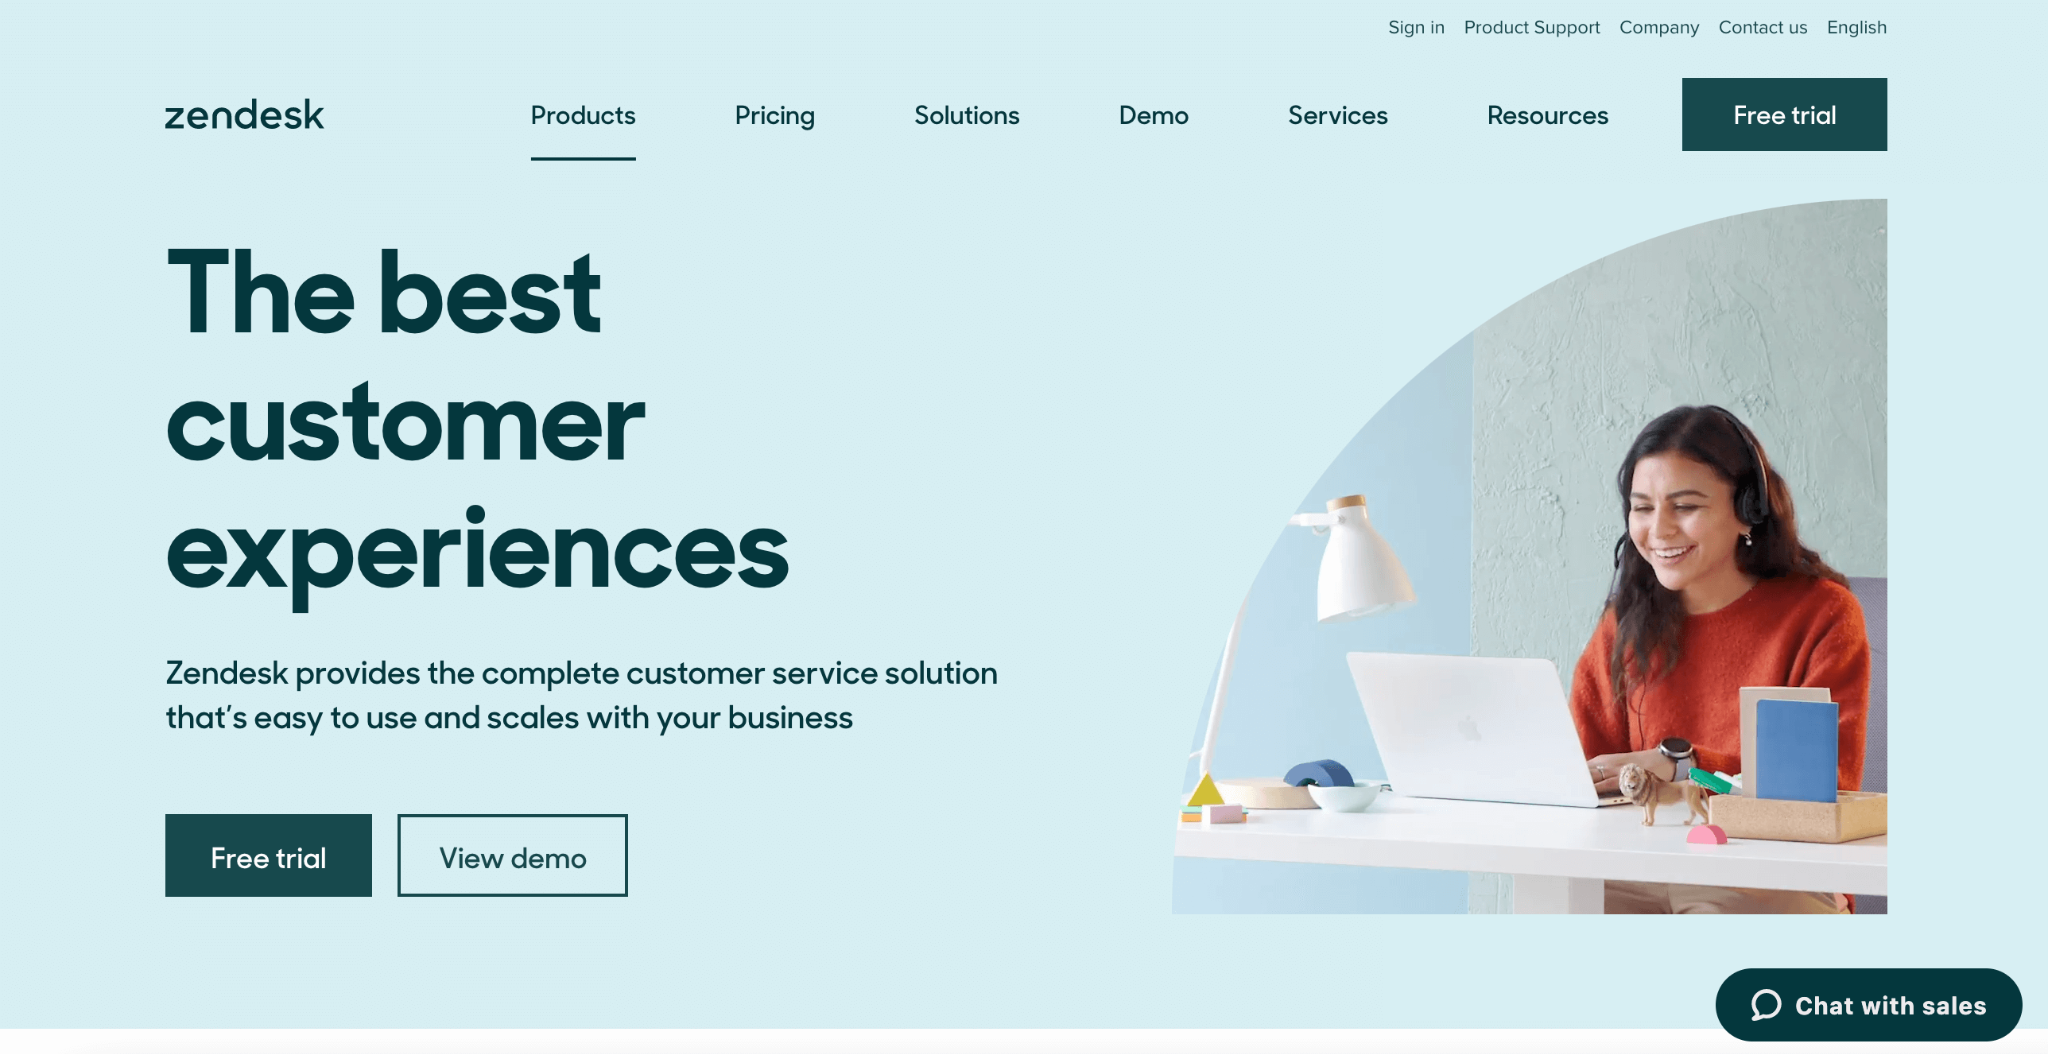 Zendesk homepage: The best customer experiences